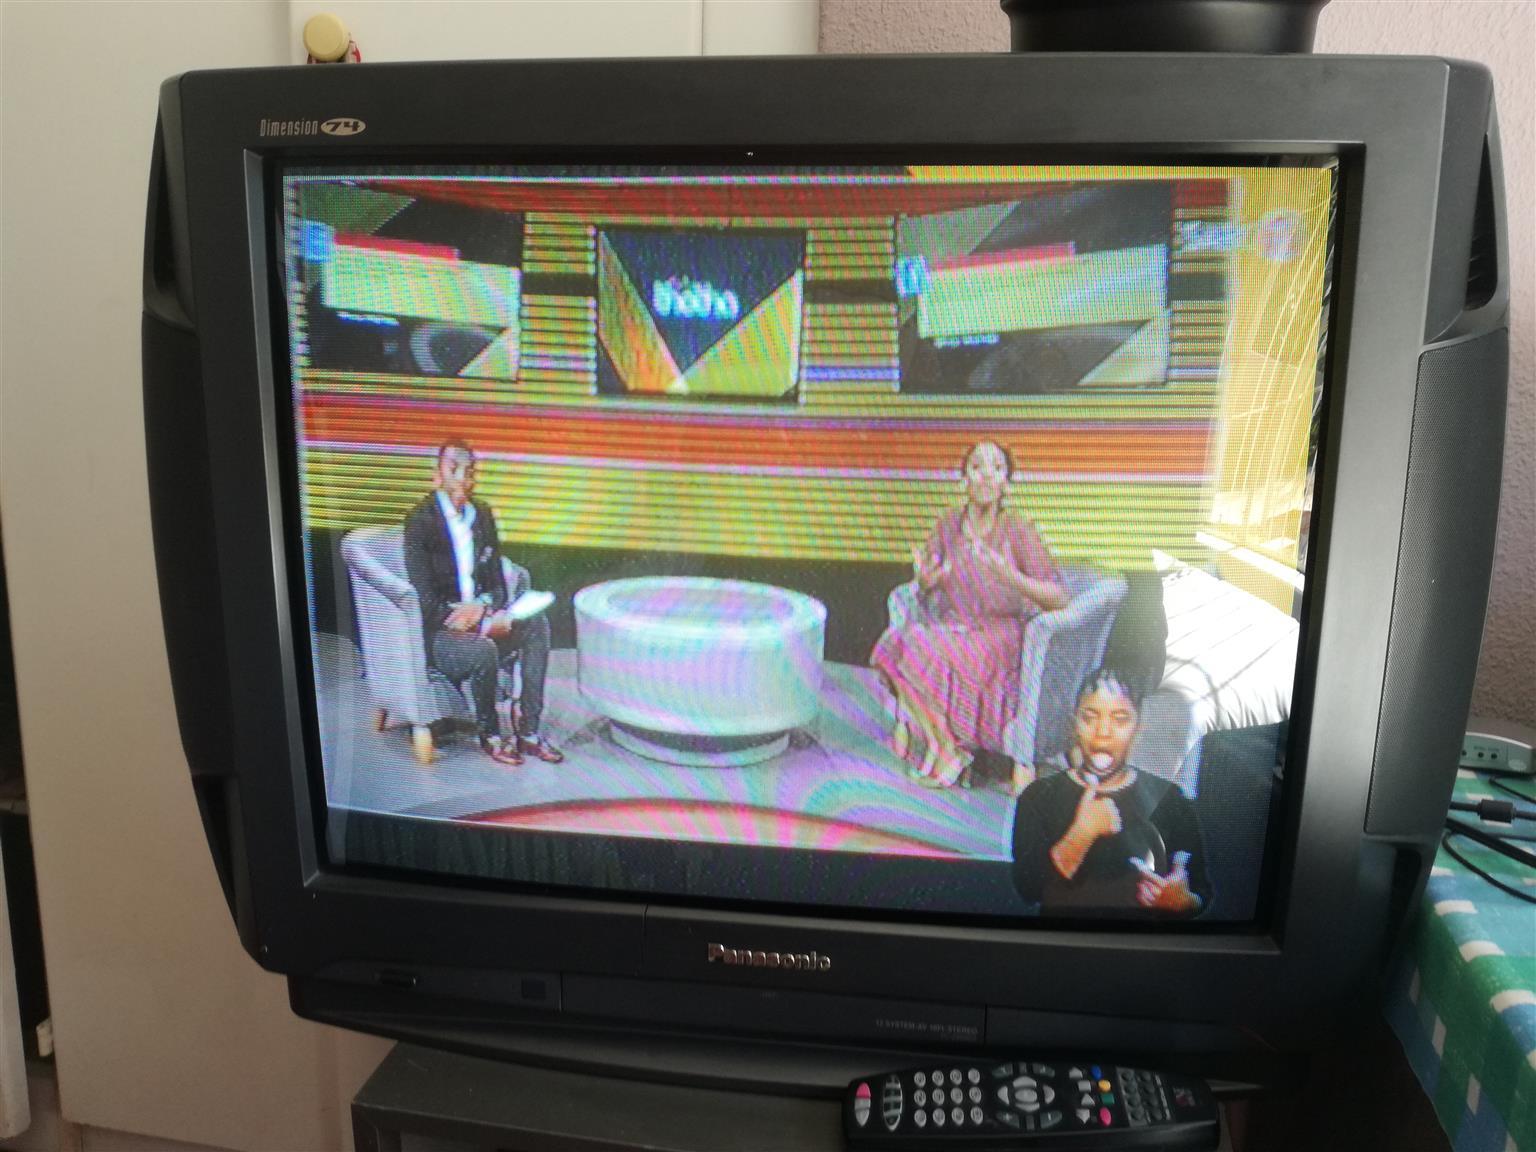 Panasonic 74cm box tv with universal remote control.